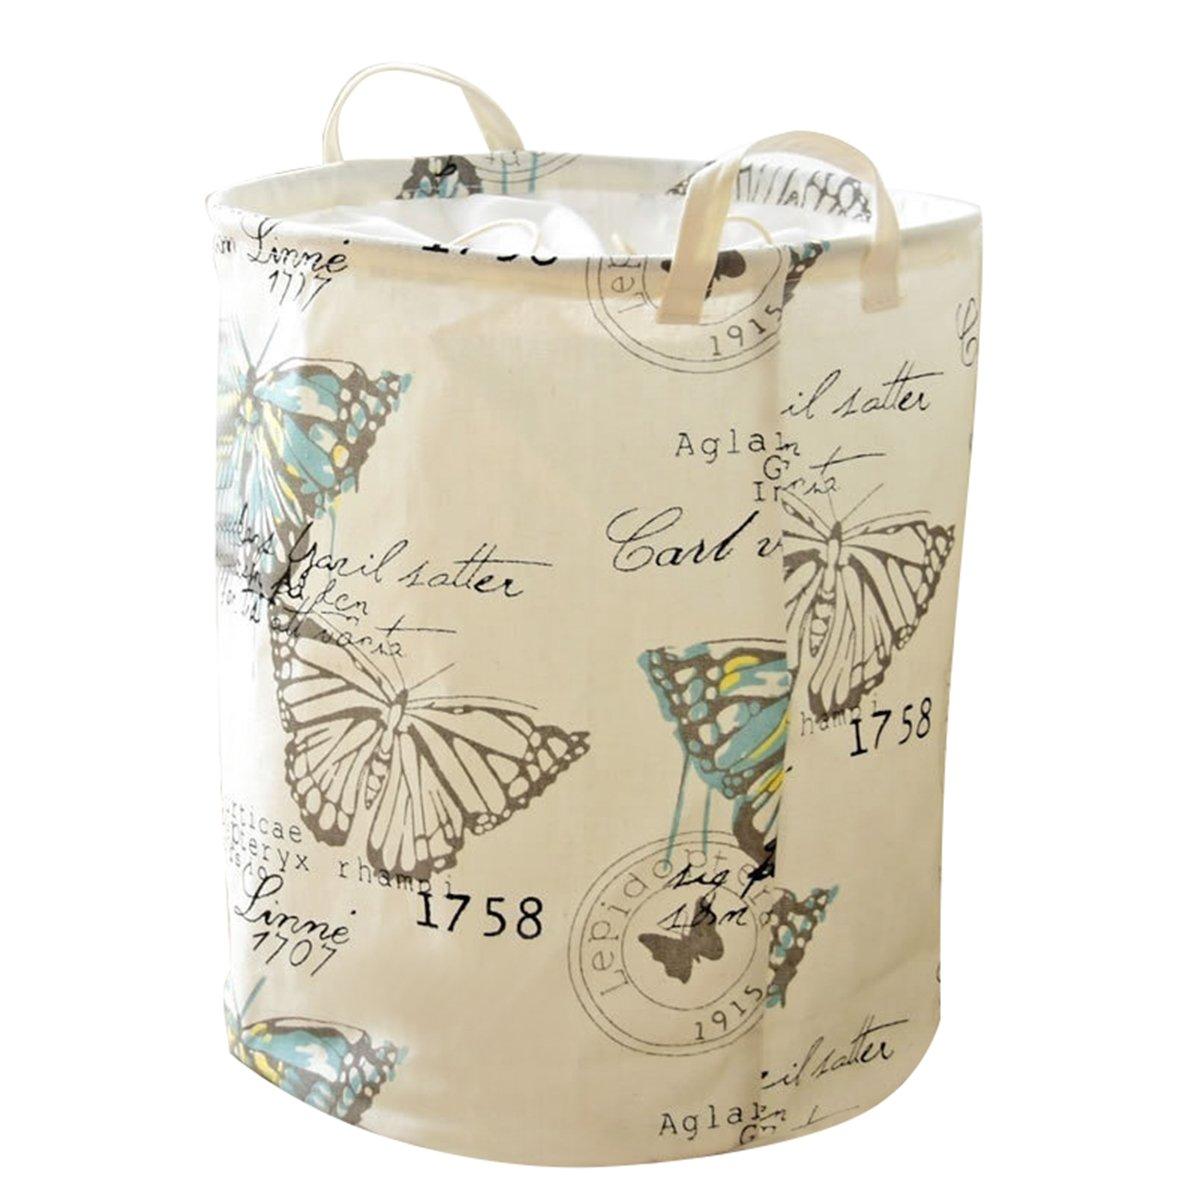 Caroeas Pretty Cute 18.1 Butterfly Laundry Basket Food Safe Dust-Proof Storage Hamper Double Layer Eco-friendly Fabric Bin Waterproof Laundry Bag Round Caroeas Home Decoration Co. ltd